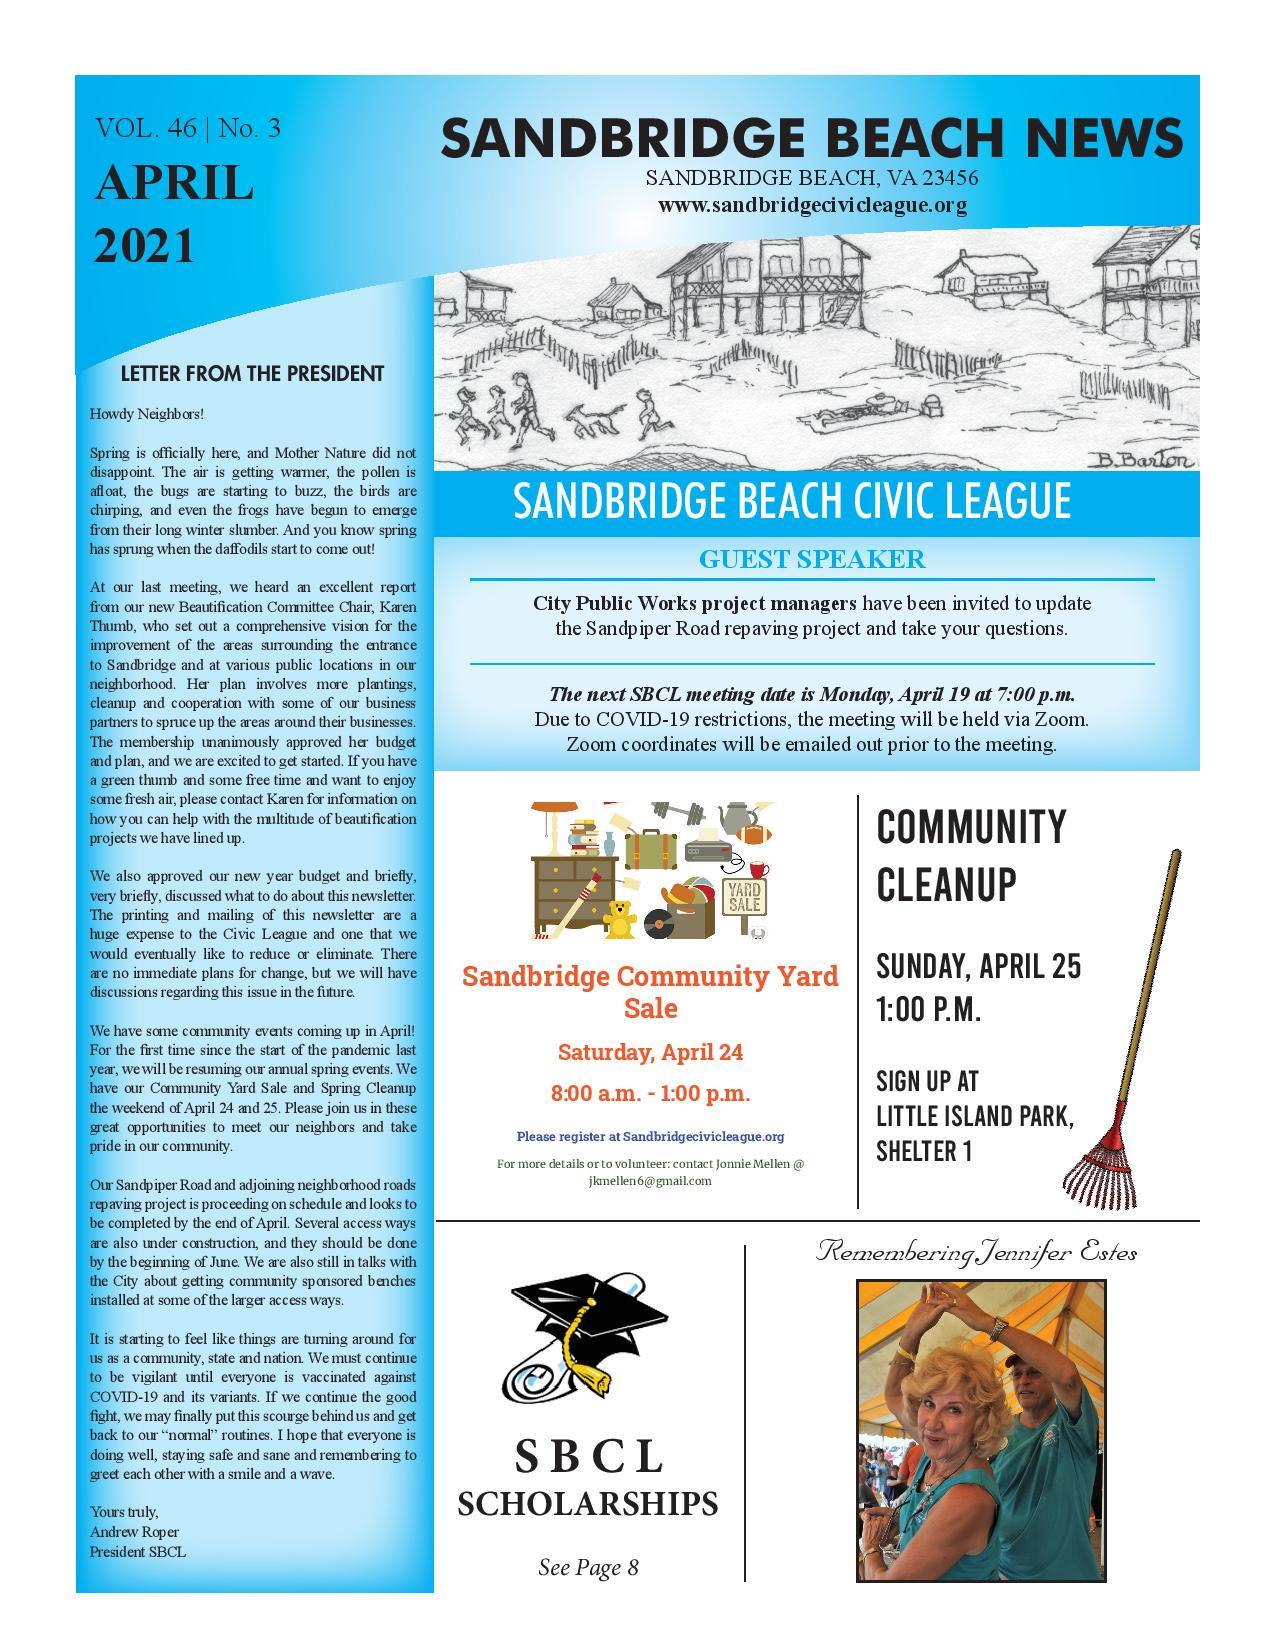 SBCL Newsletter April 2021